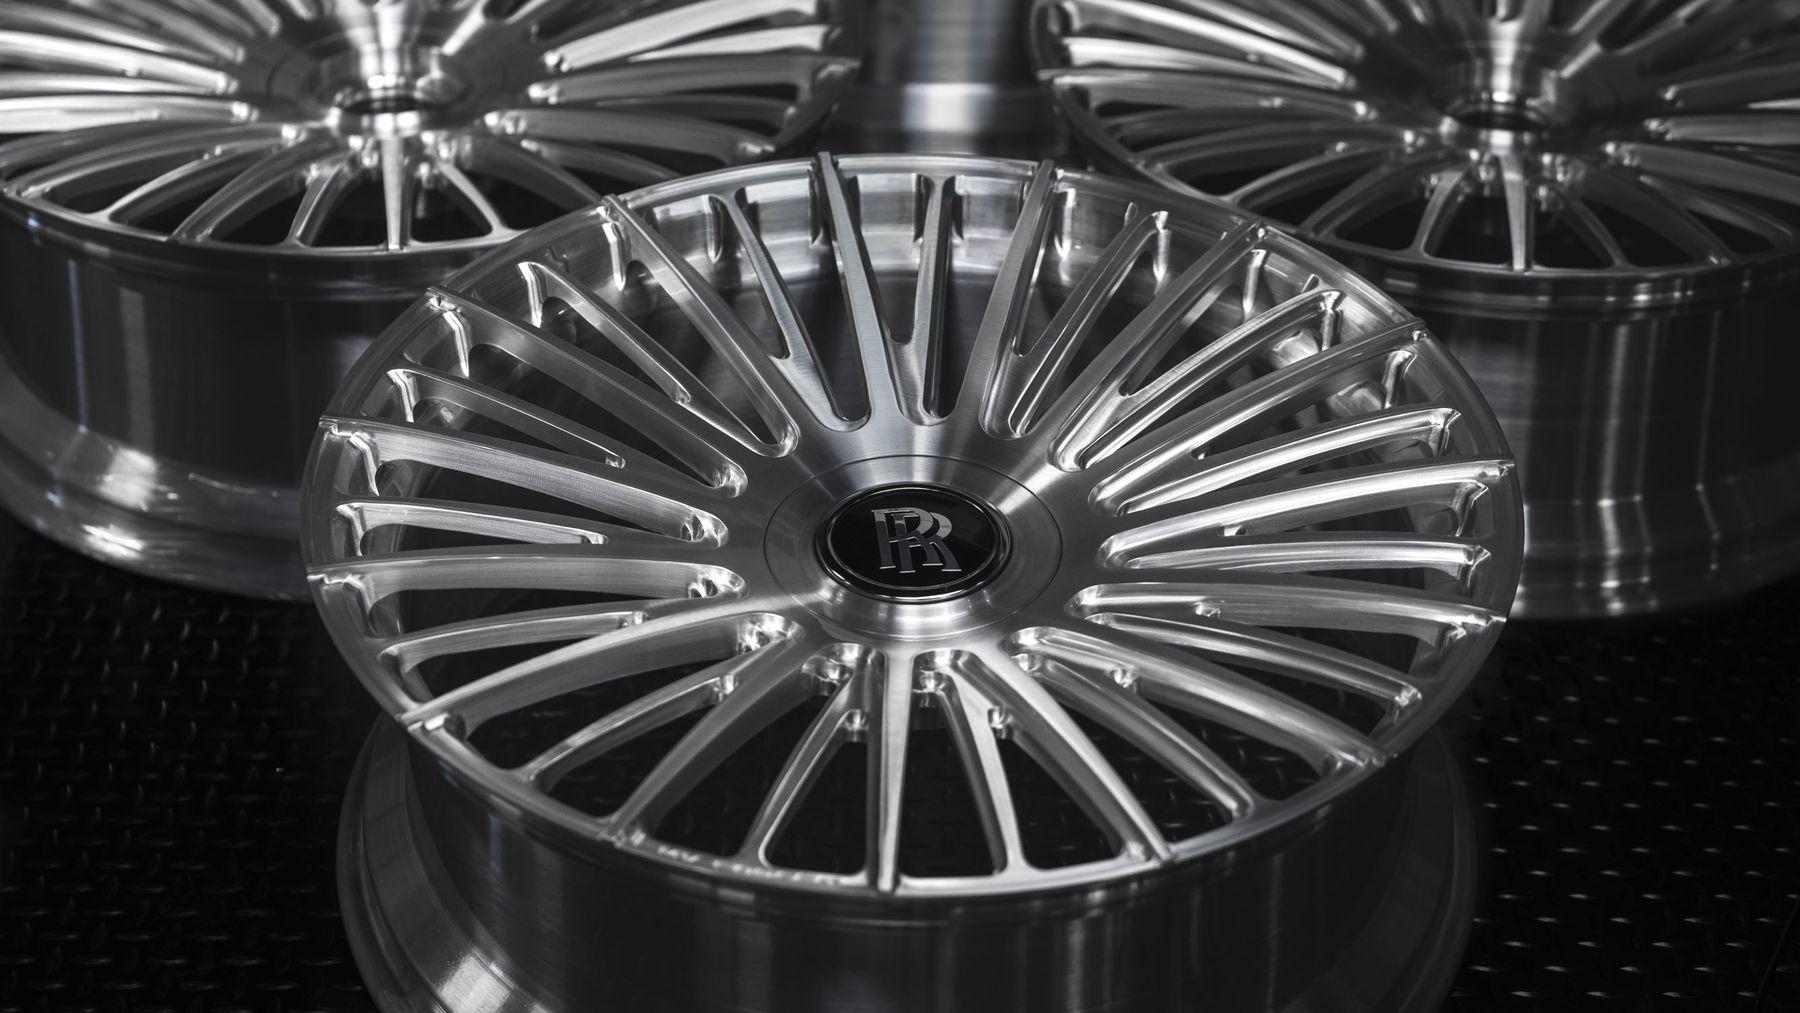 Modular Velge RR-100 MONO forged wheels